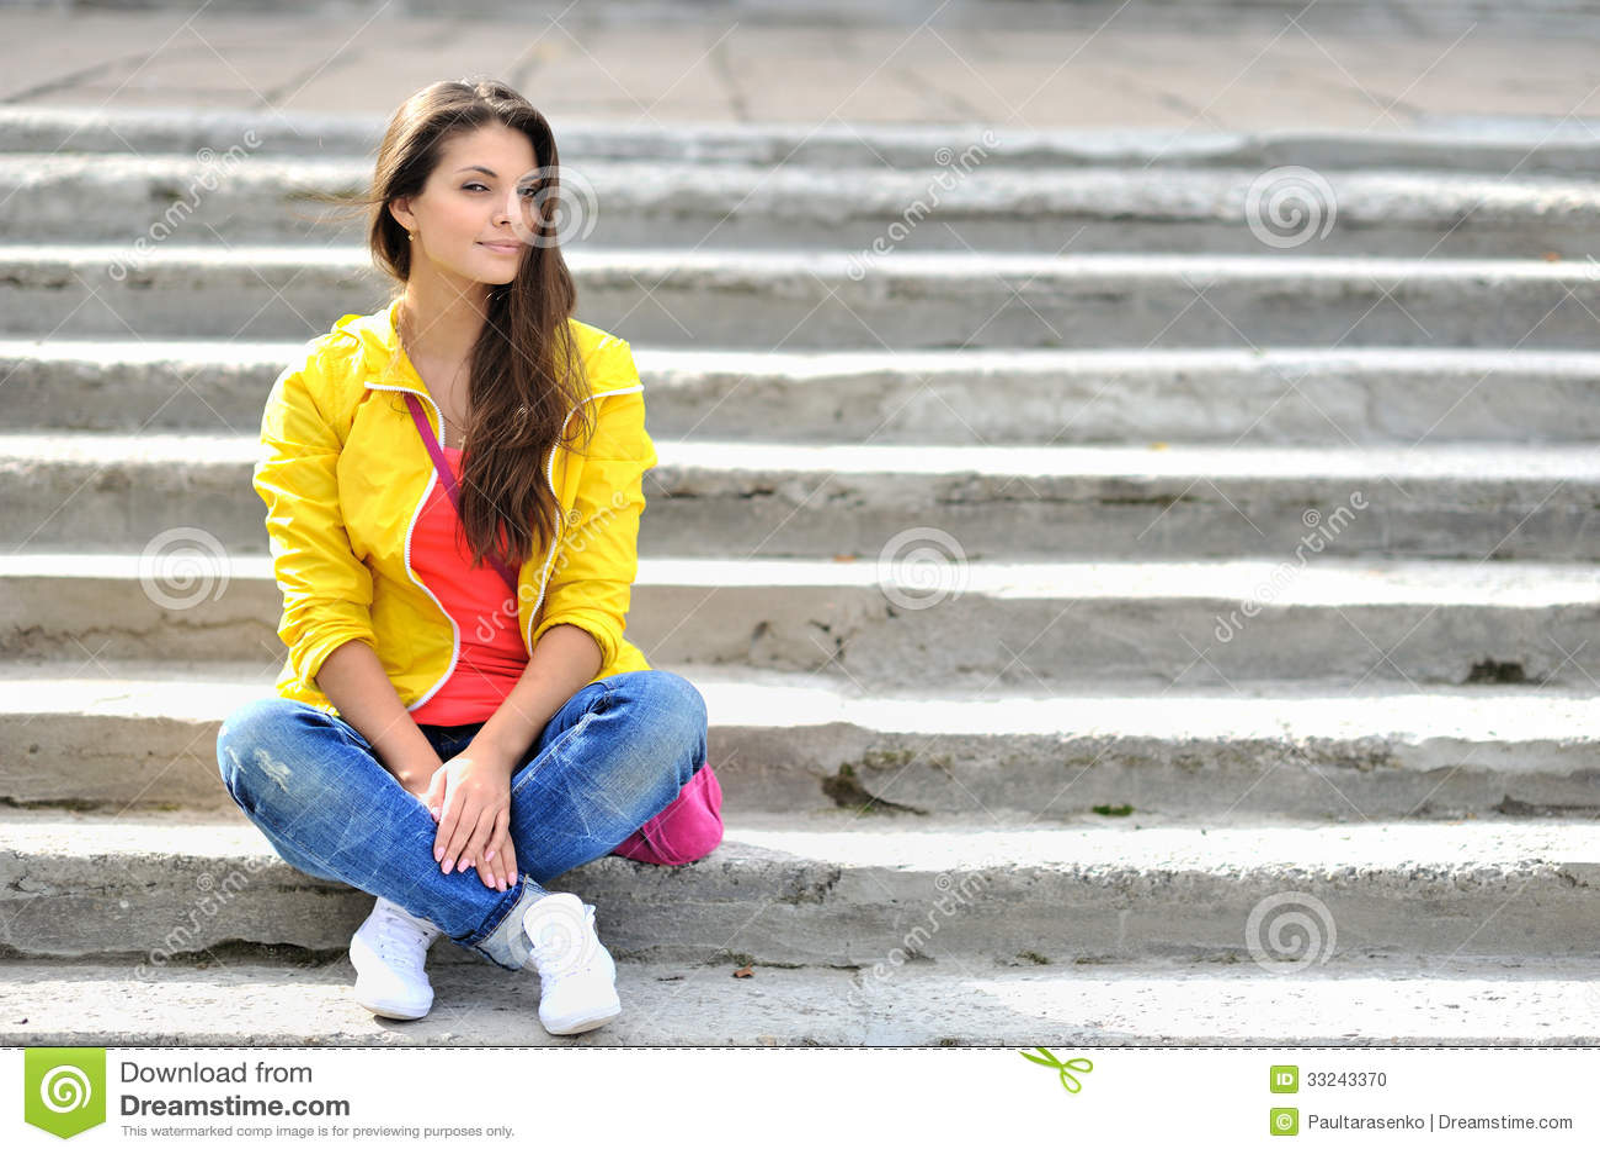 Fashion Girl Urban Style Portrait Outdoor Stock Photo Image 33243370